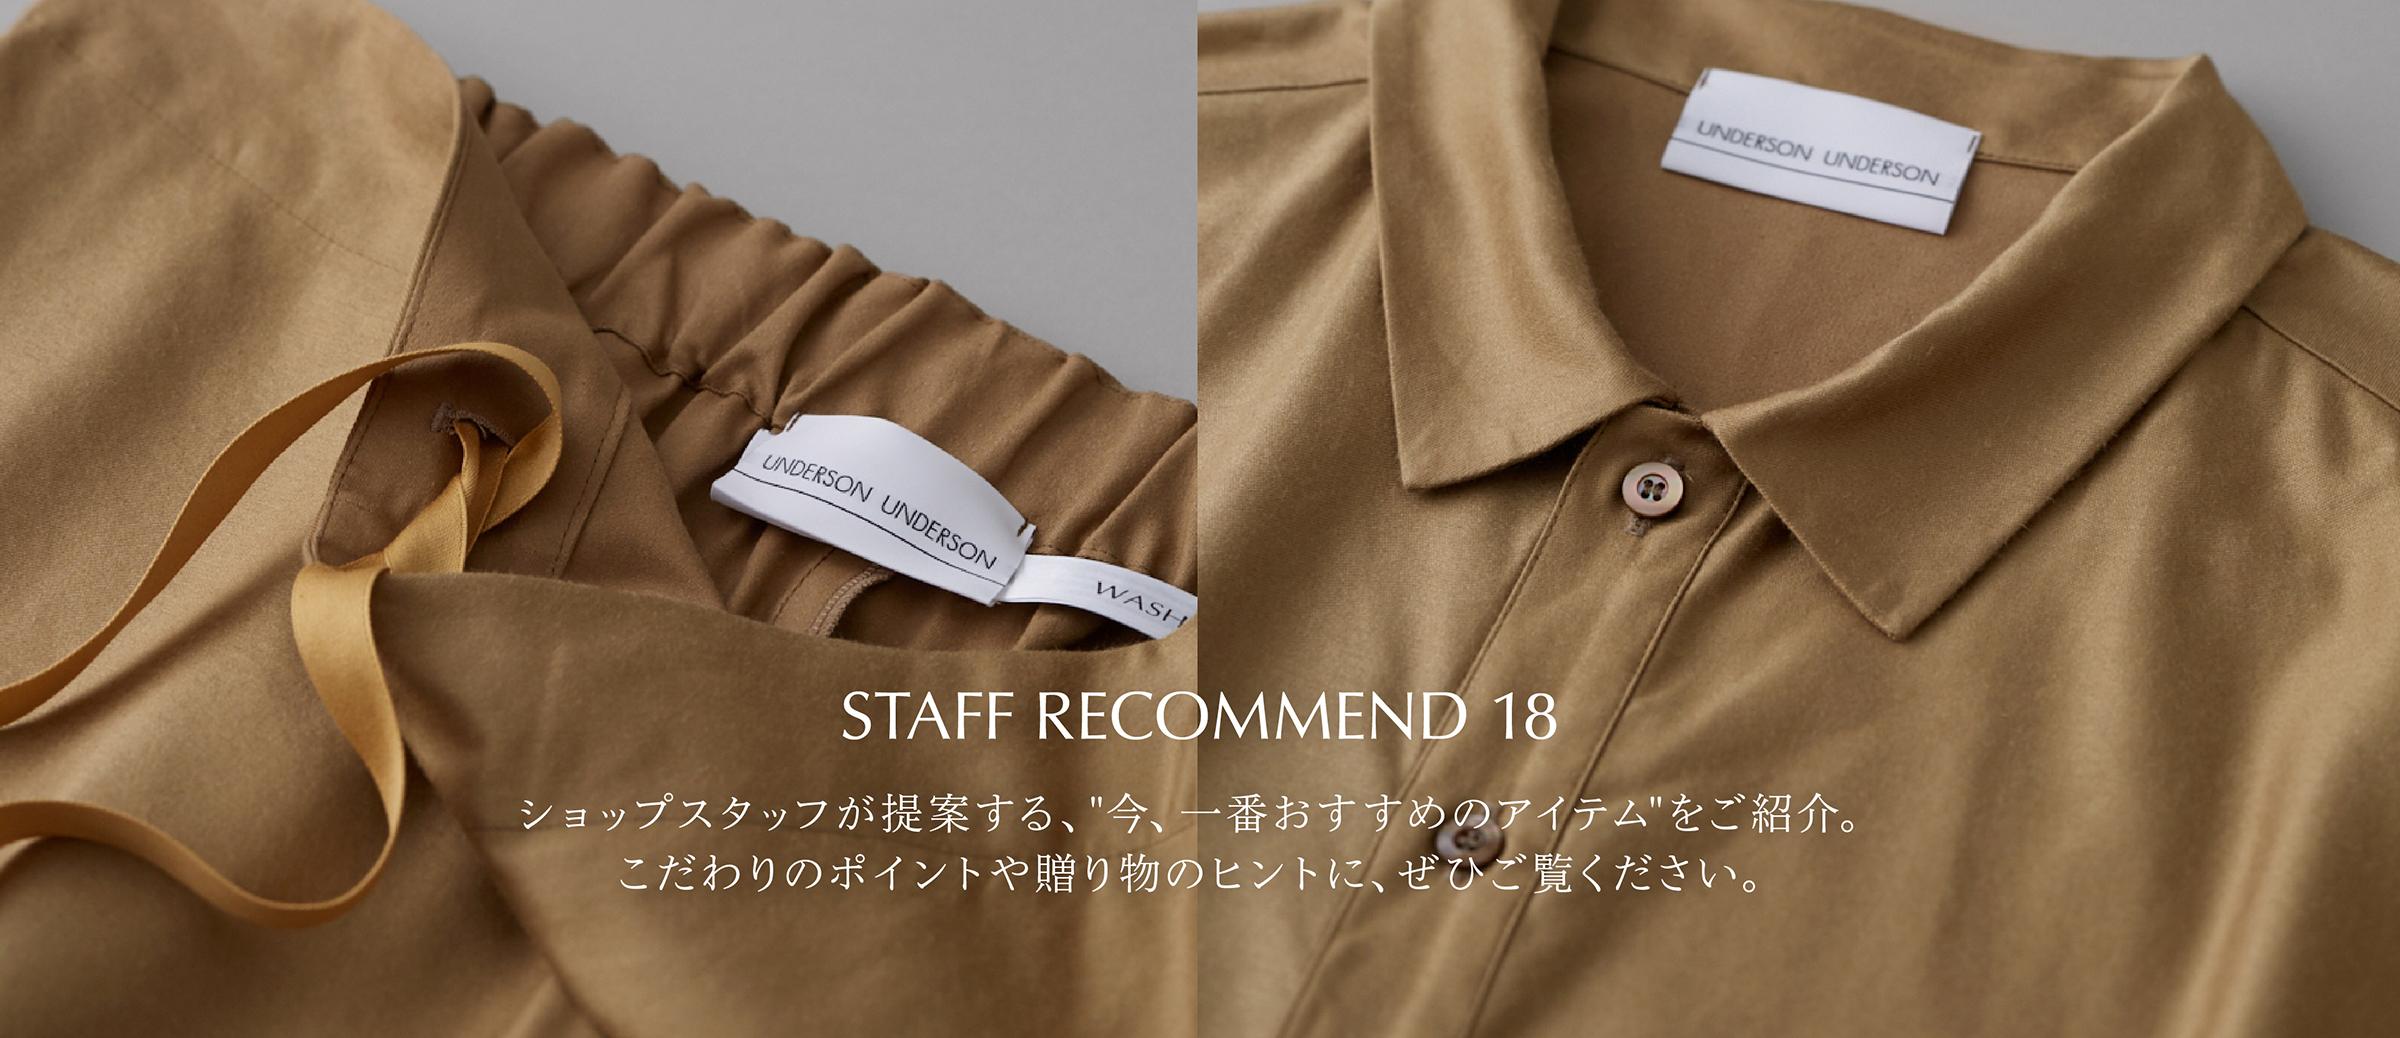 UU210127staffrecommend